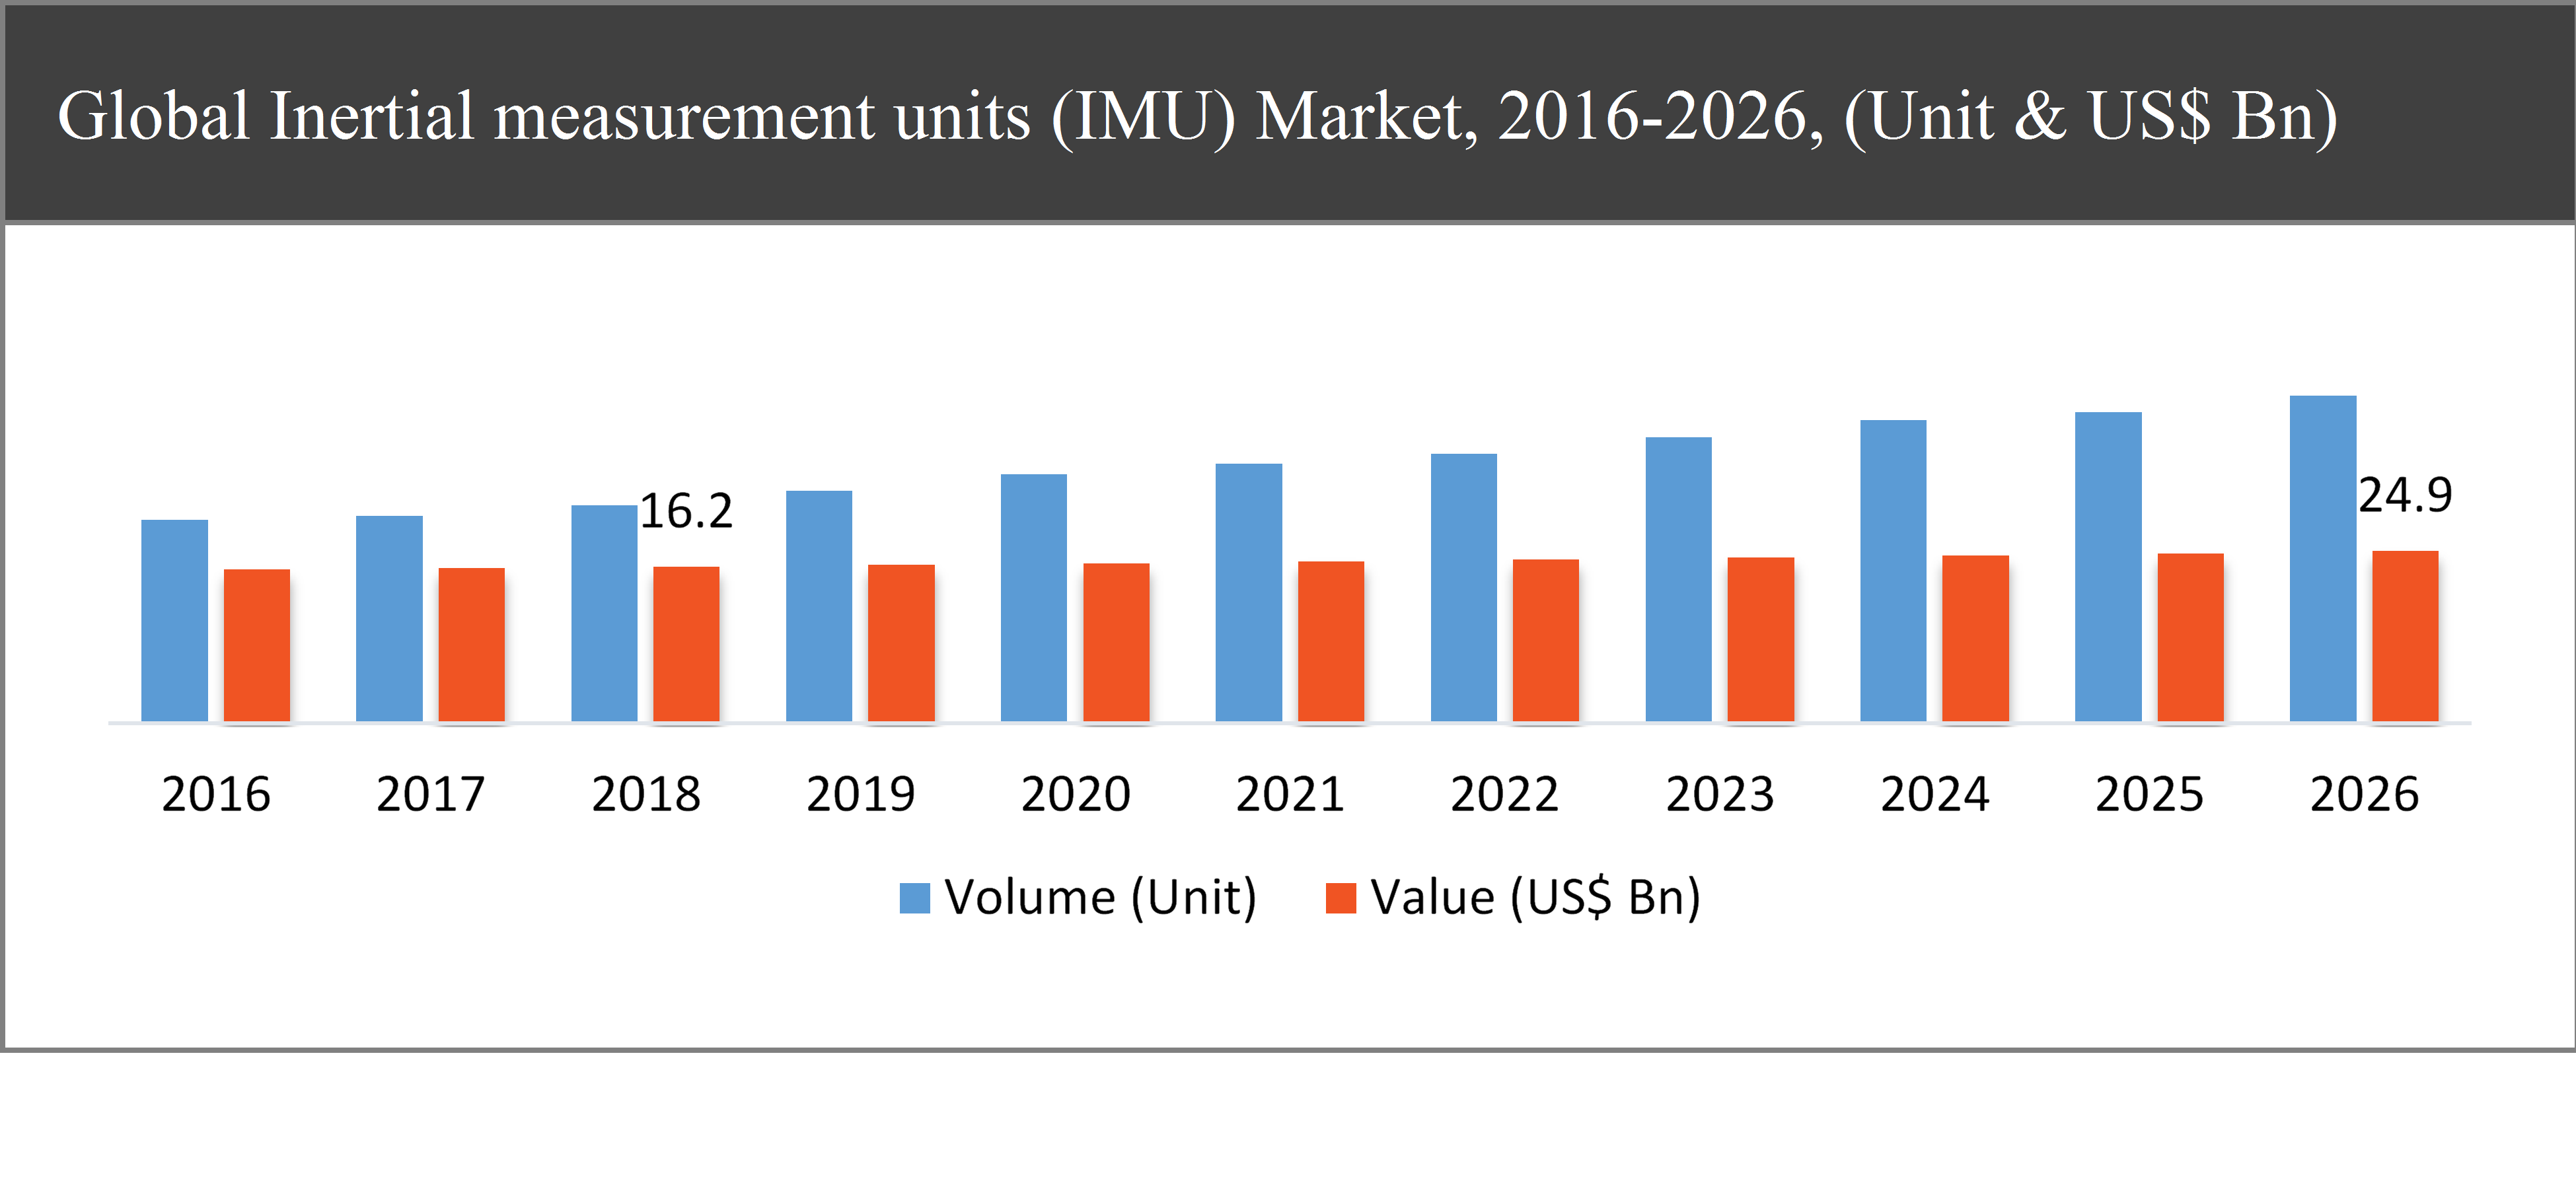 Inertial measurement units (IMU) Market